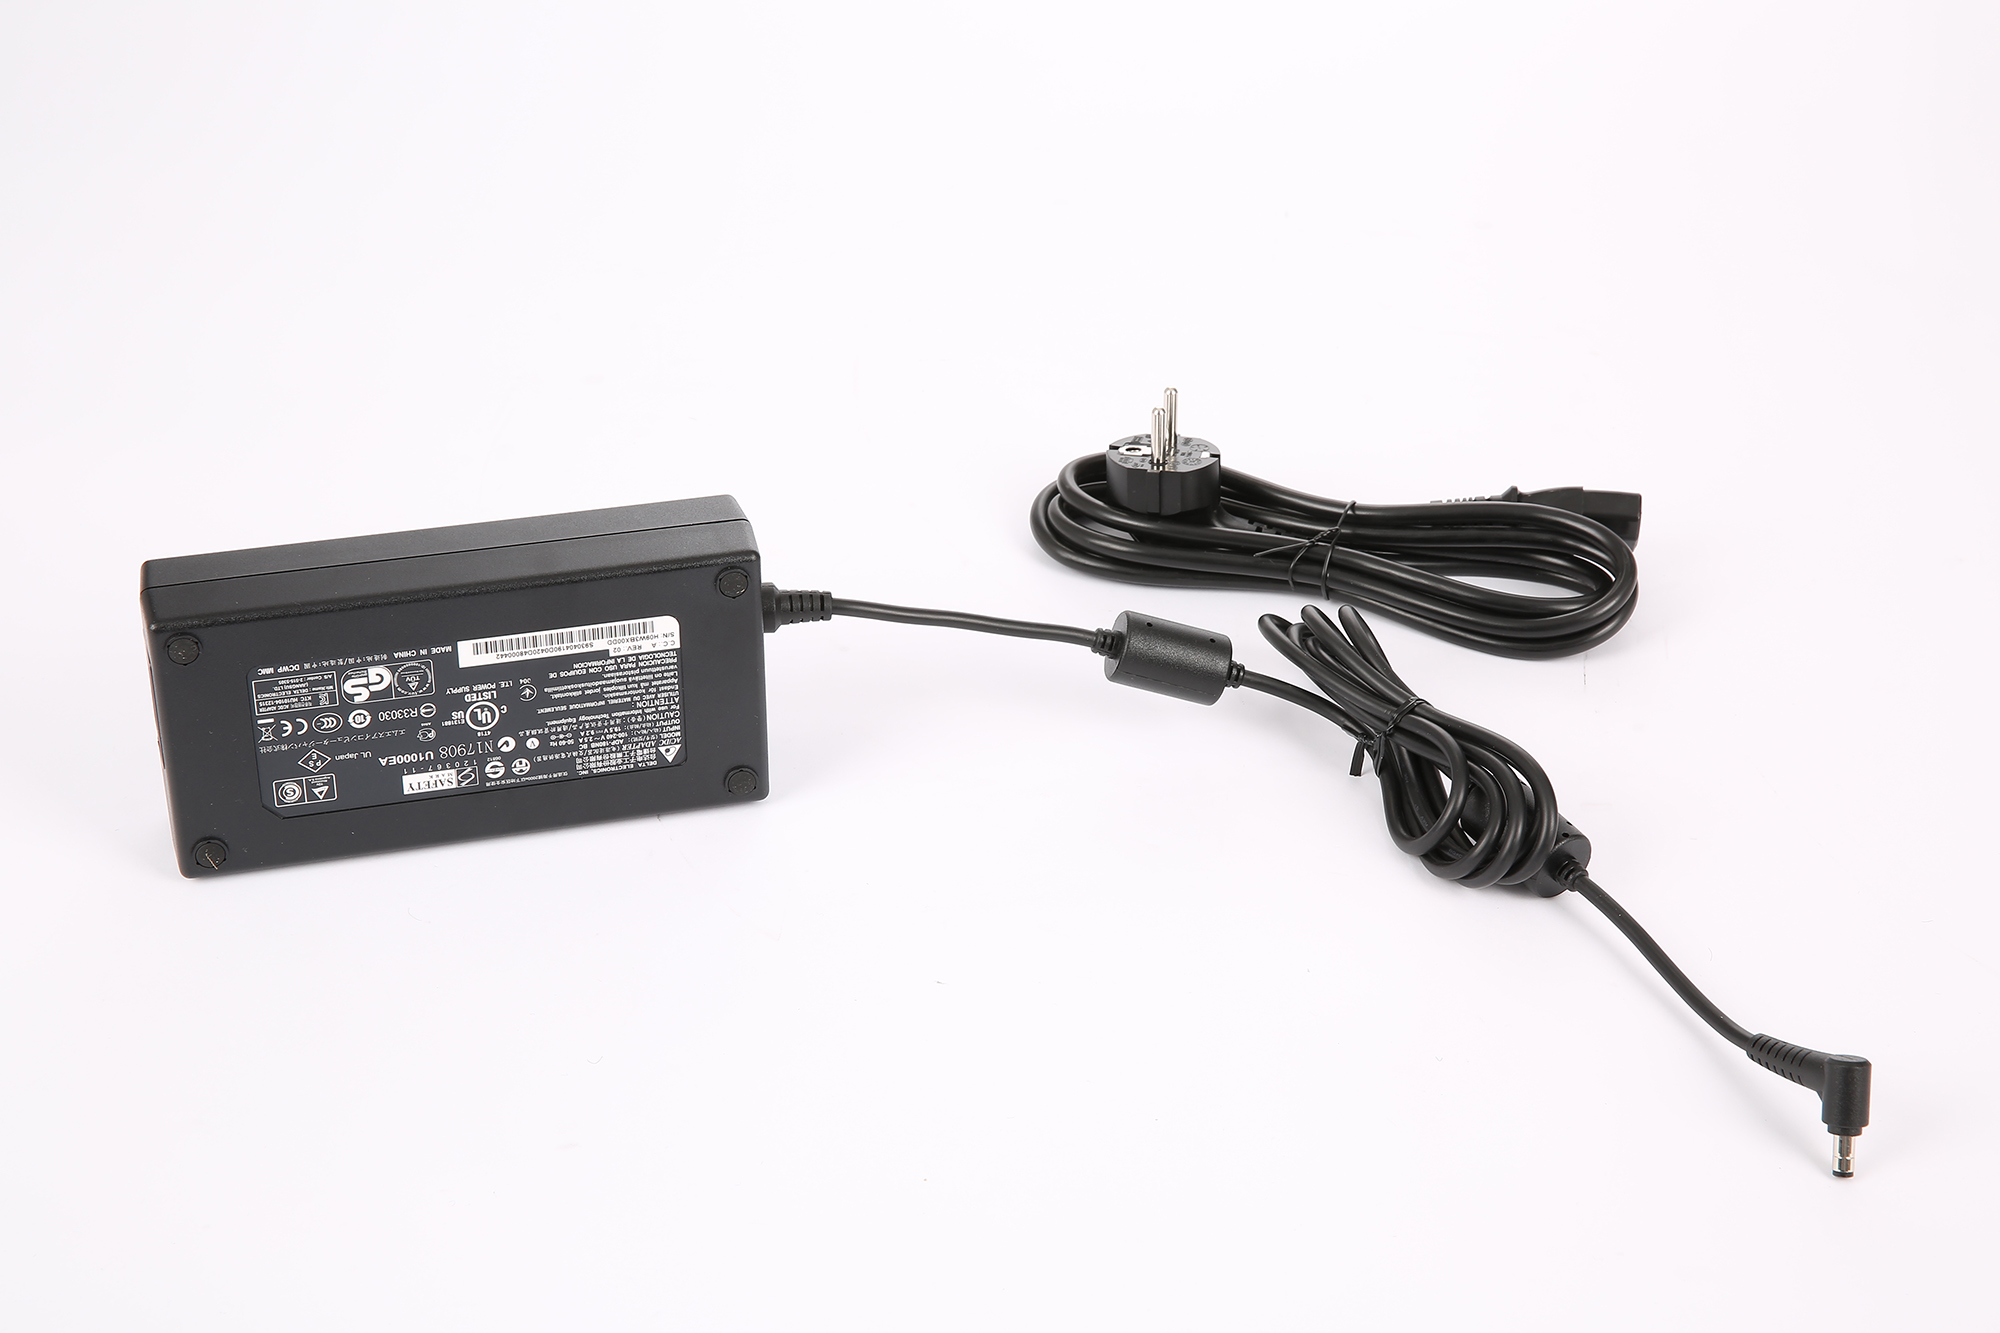 MONSTER® TULPAR T5 V1.1.2 15.6